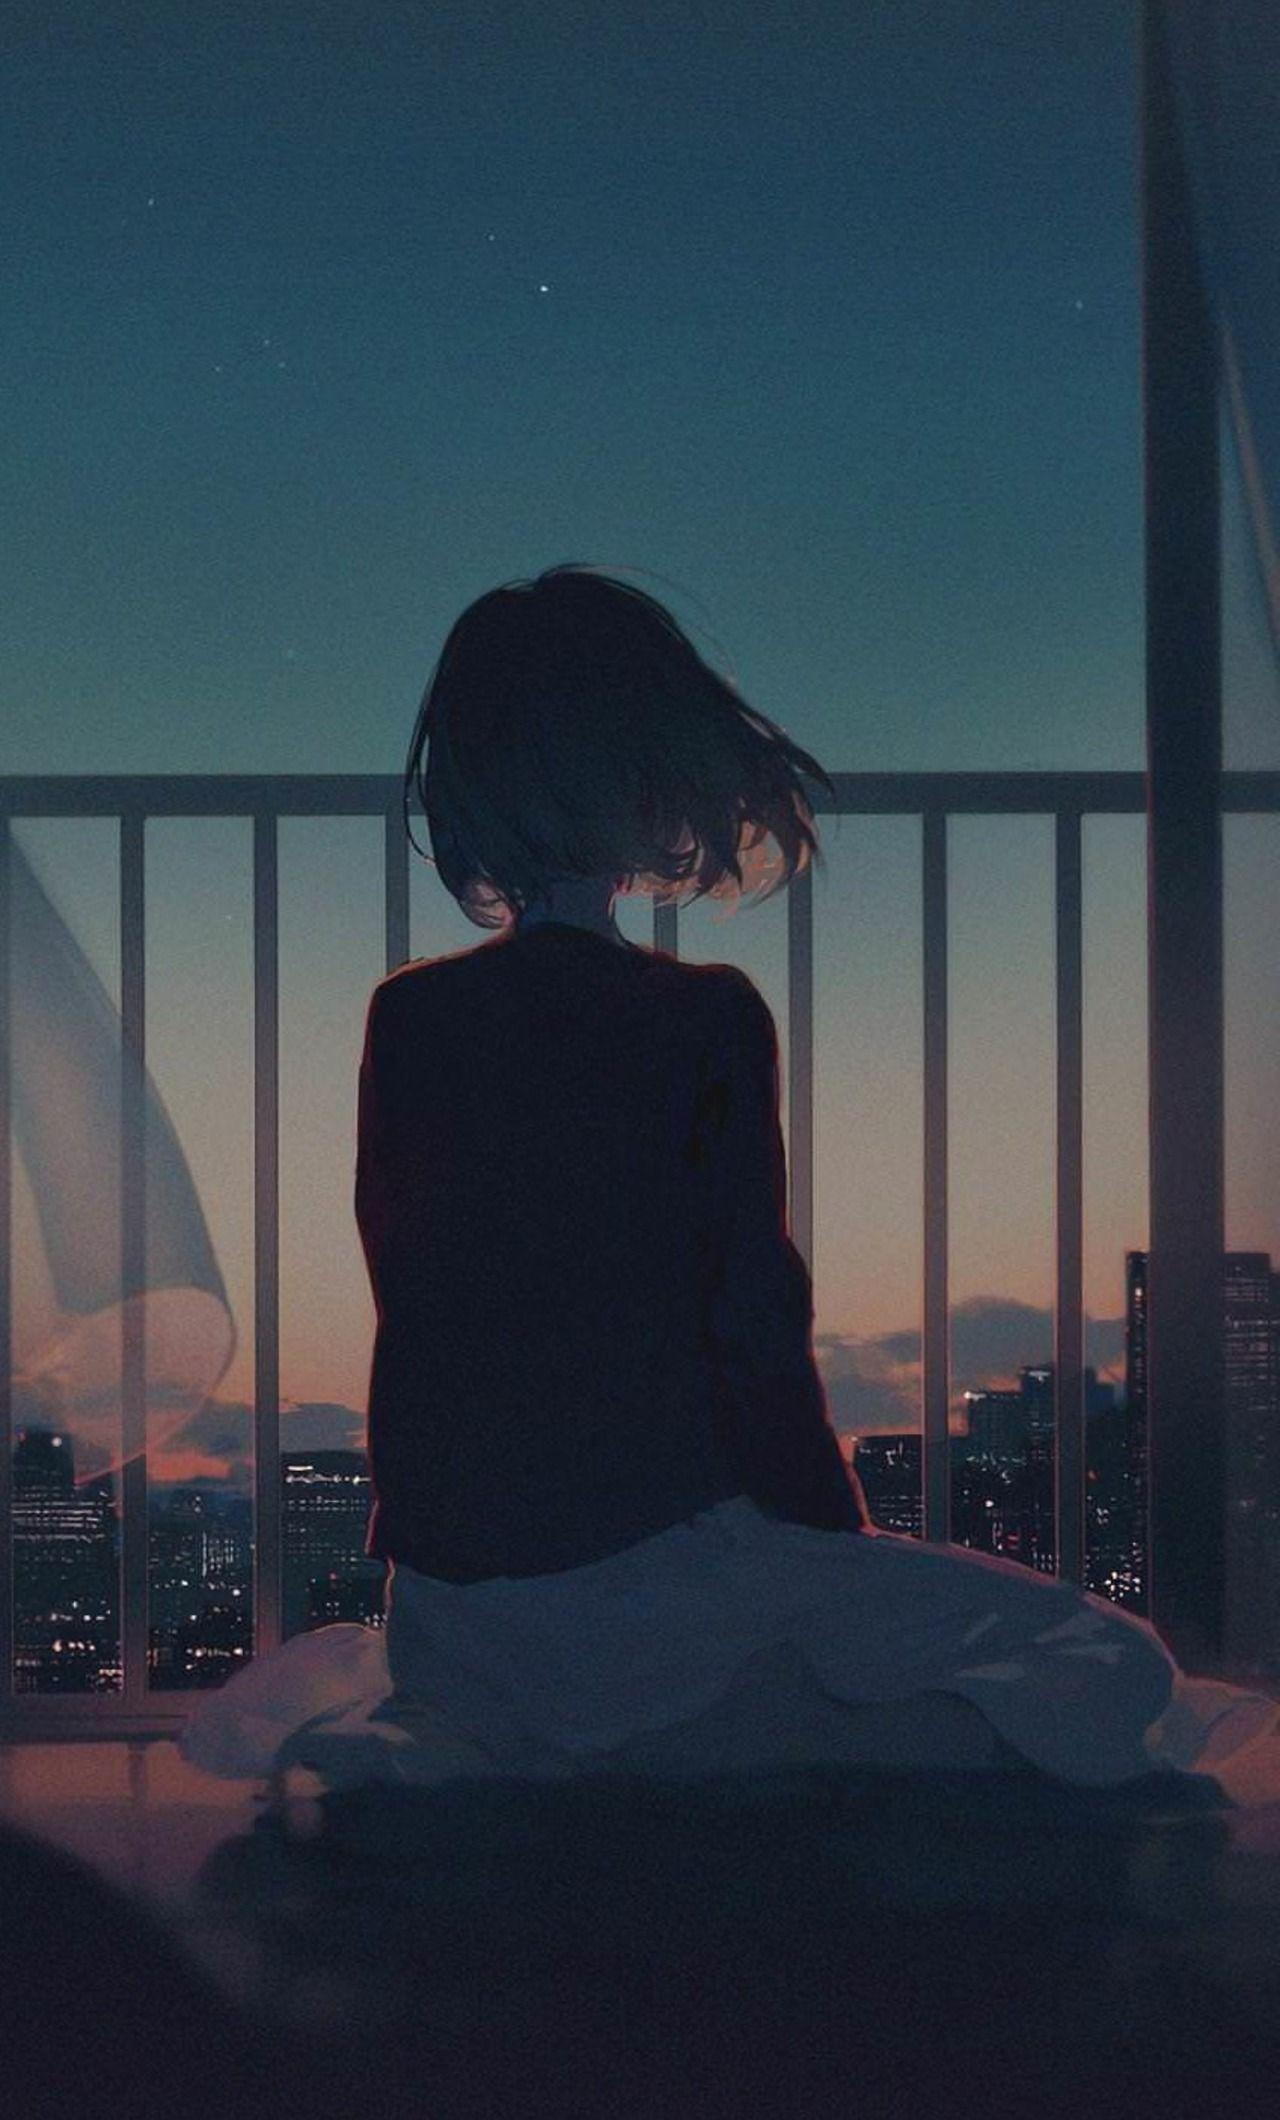 Pin on Alone girl